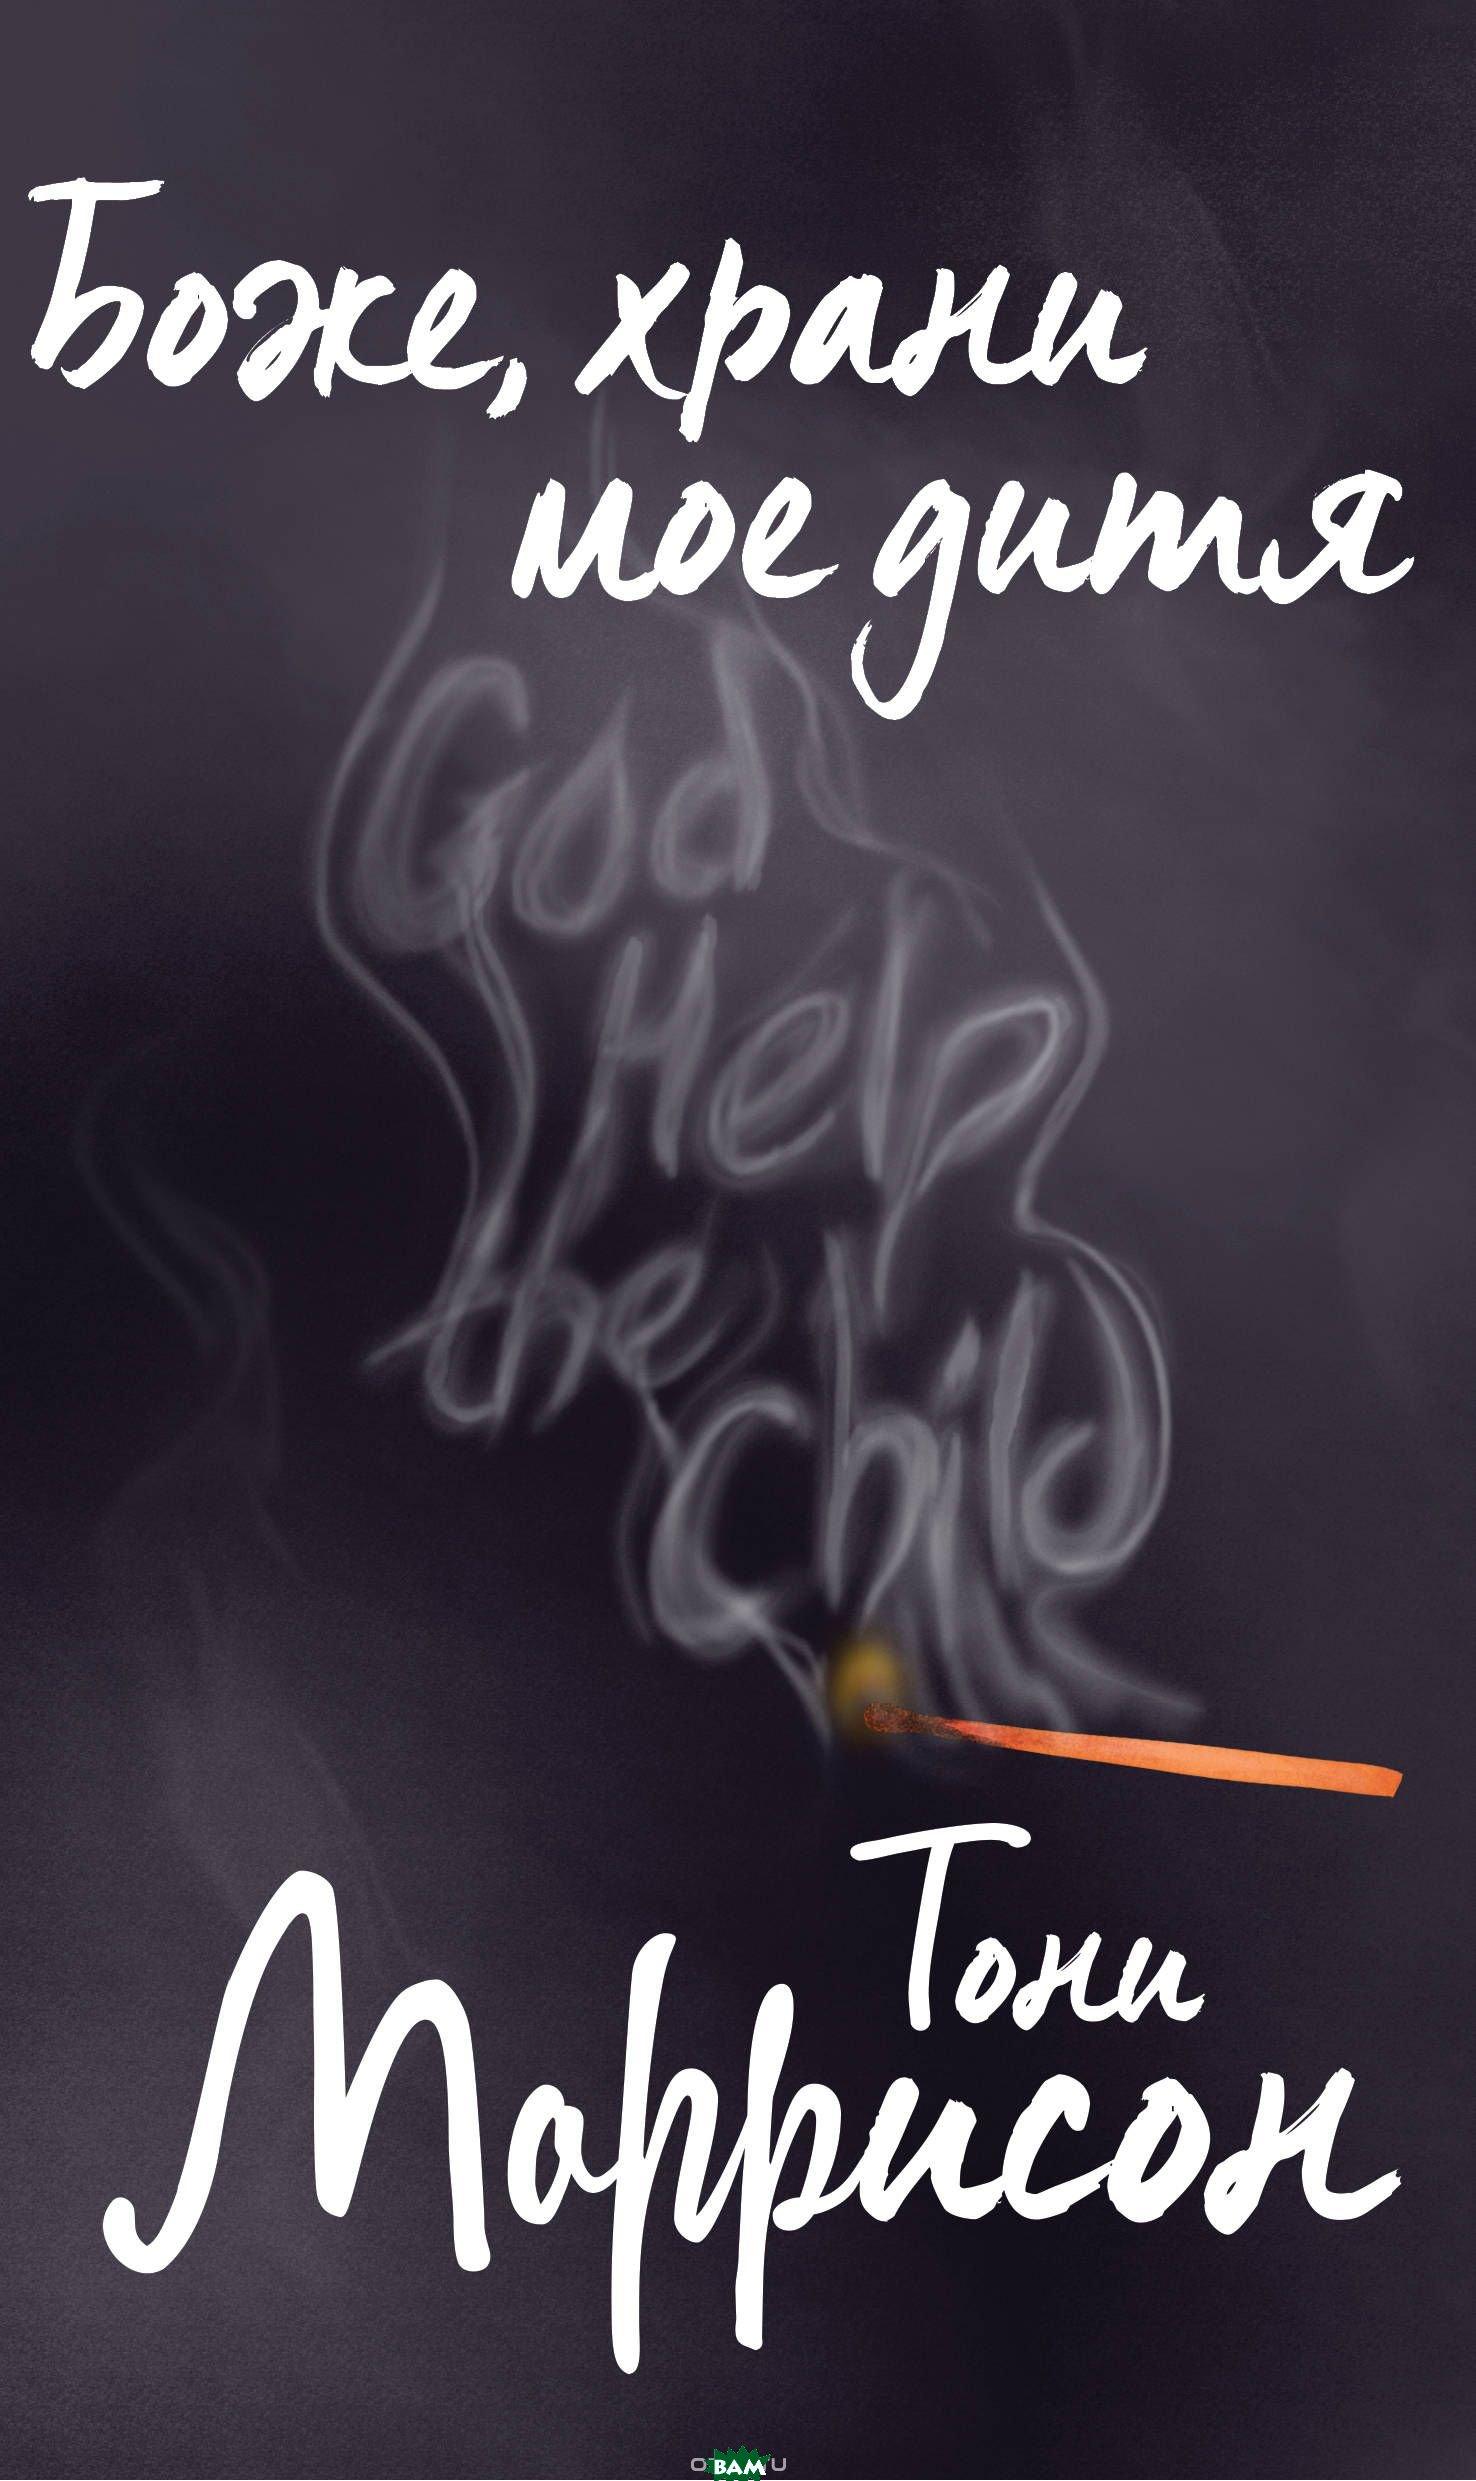 Купить Боже, храни мое дитя, Like Book, Моррисон Тони, 978-5-04-097609-6